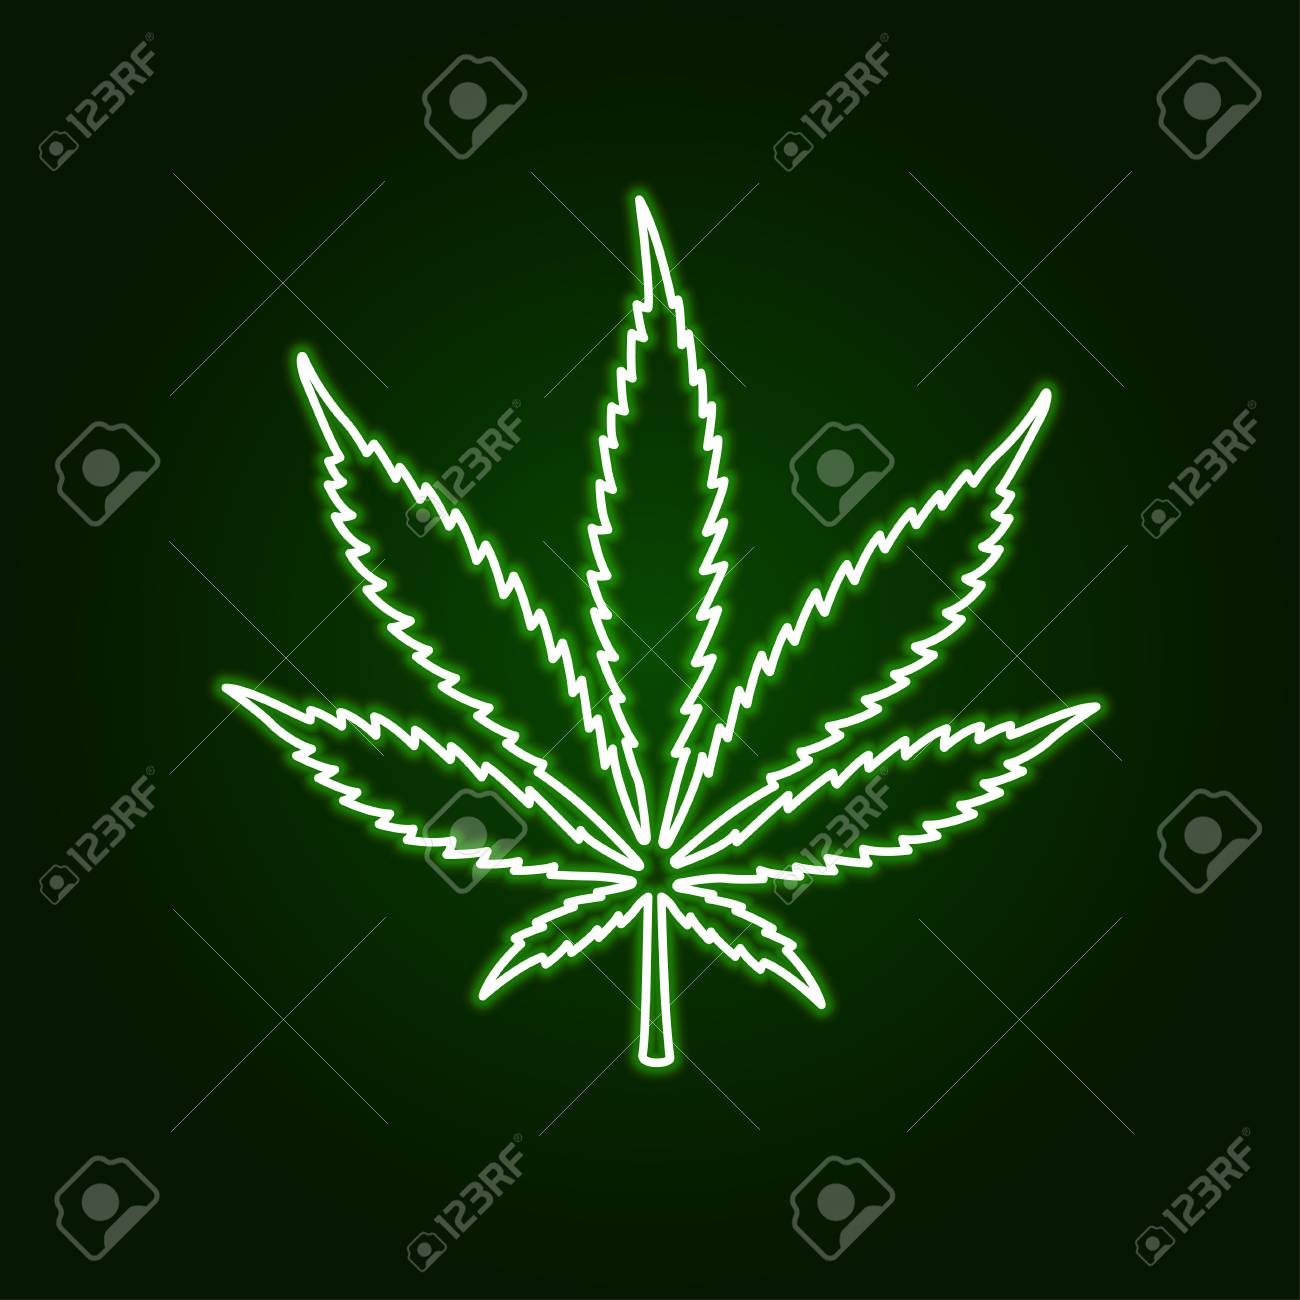 Cannabis marijuana neon glowing sign on dark background. Vector illustration. - 108155686